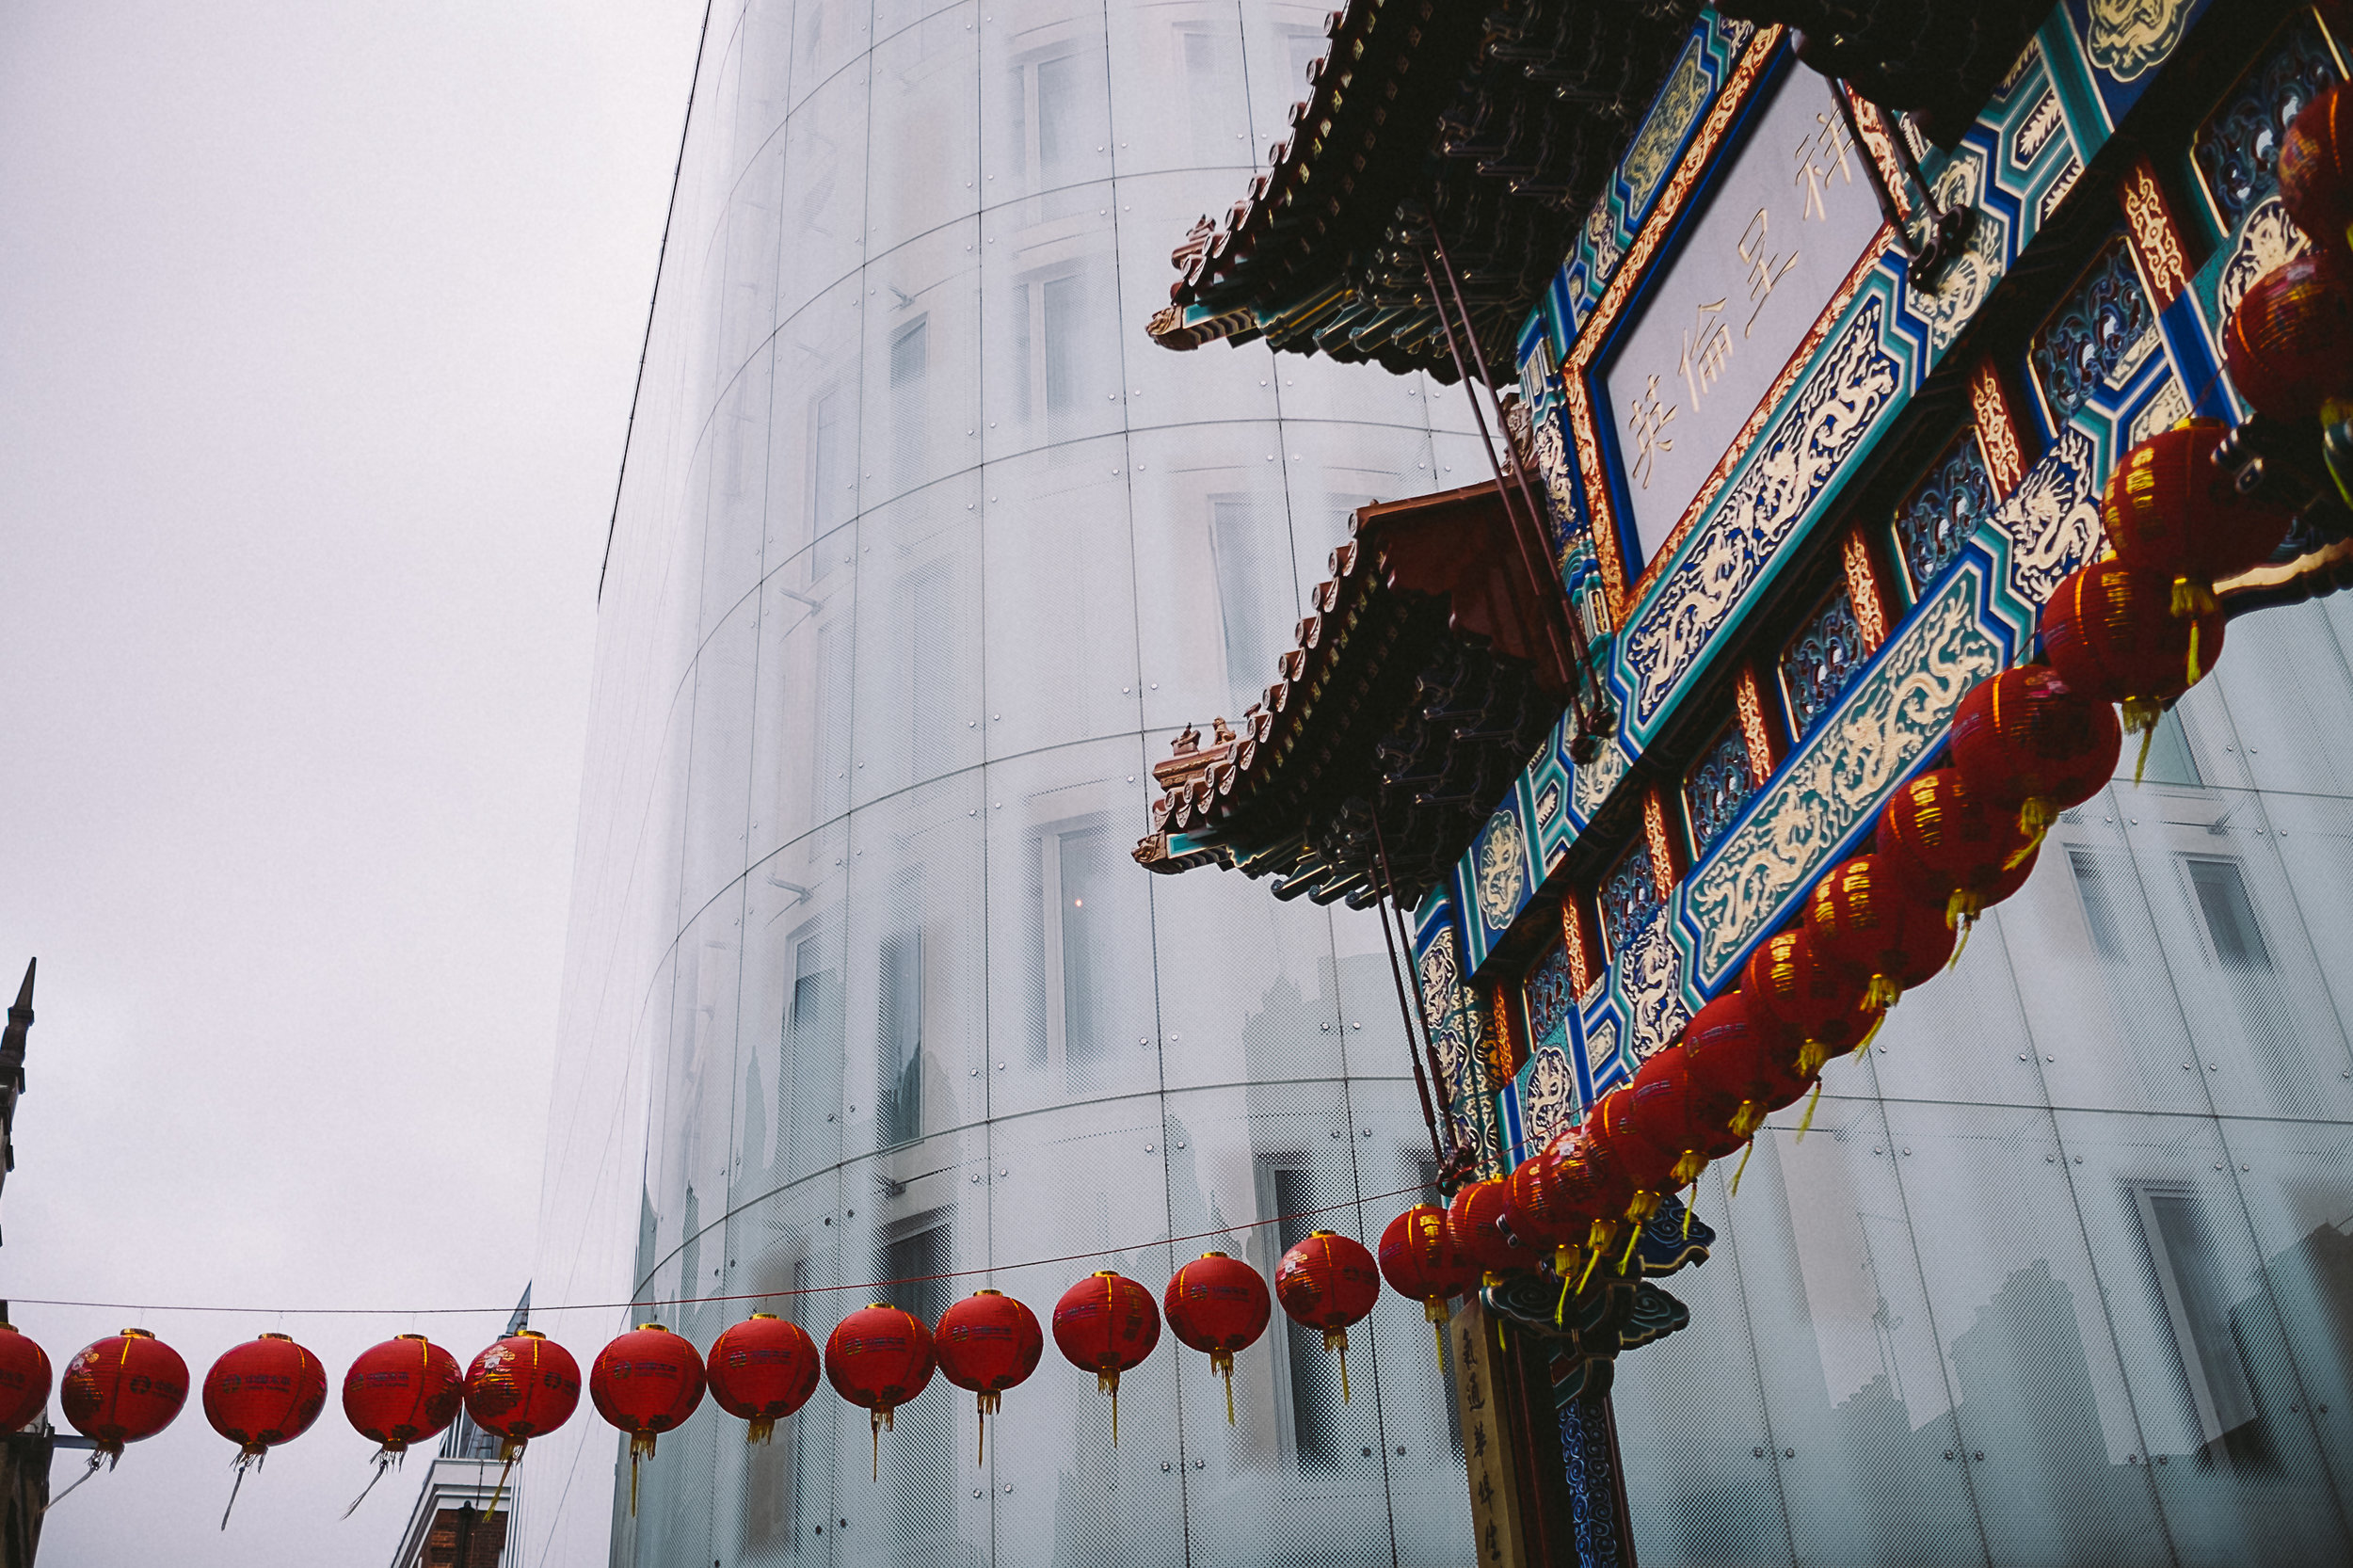 street photography chinatown-1.jpg